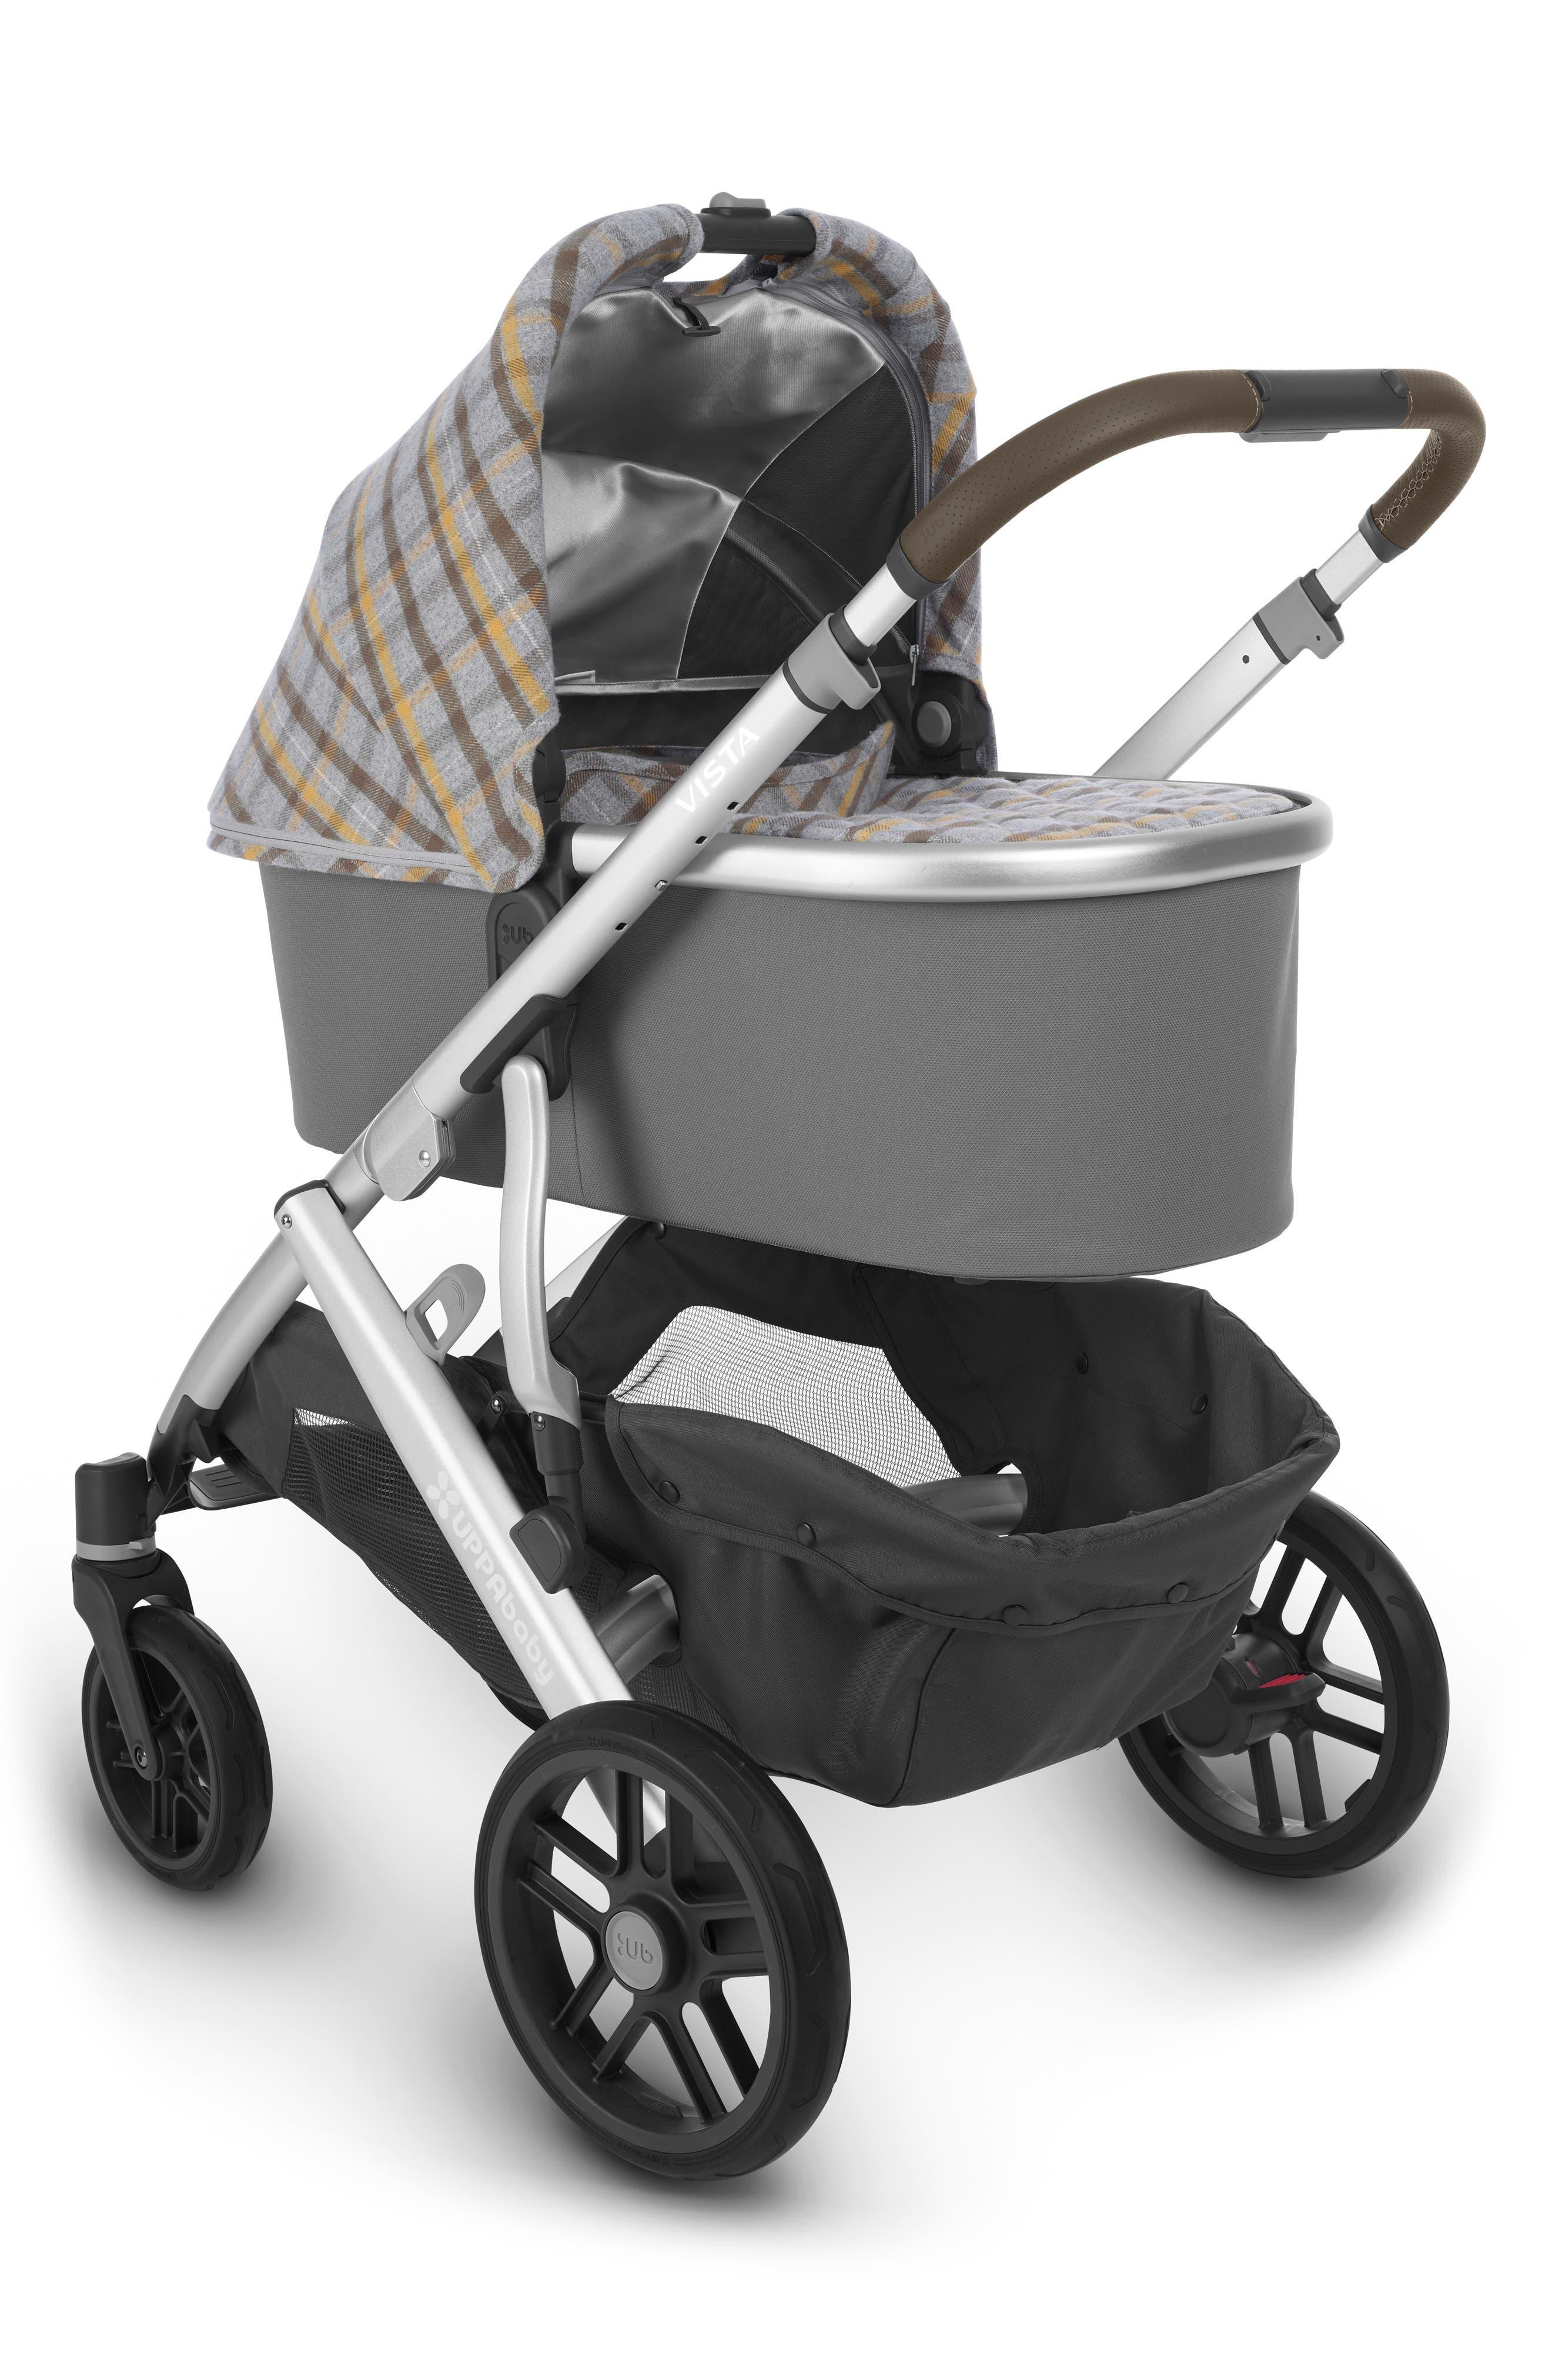 VISTA Spenser Convertible Stroller with Bassinet & Toddler Seat,                             Alternate thumbnail 3, color,                             GREY/ YELLOW TARTAN